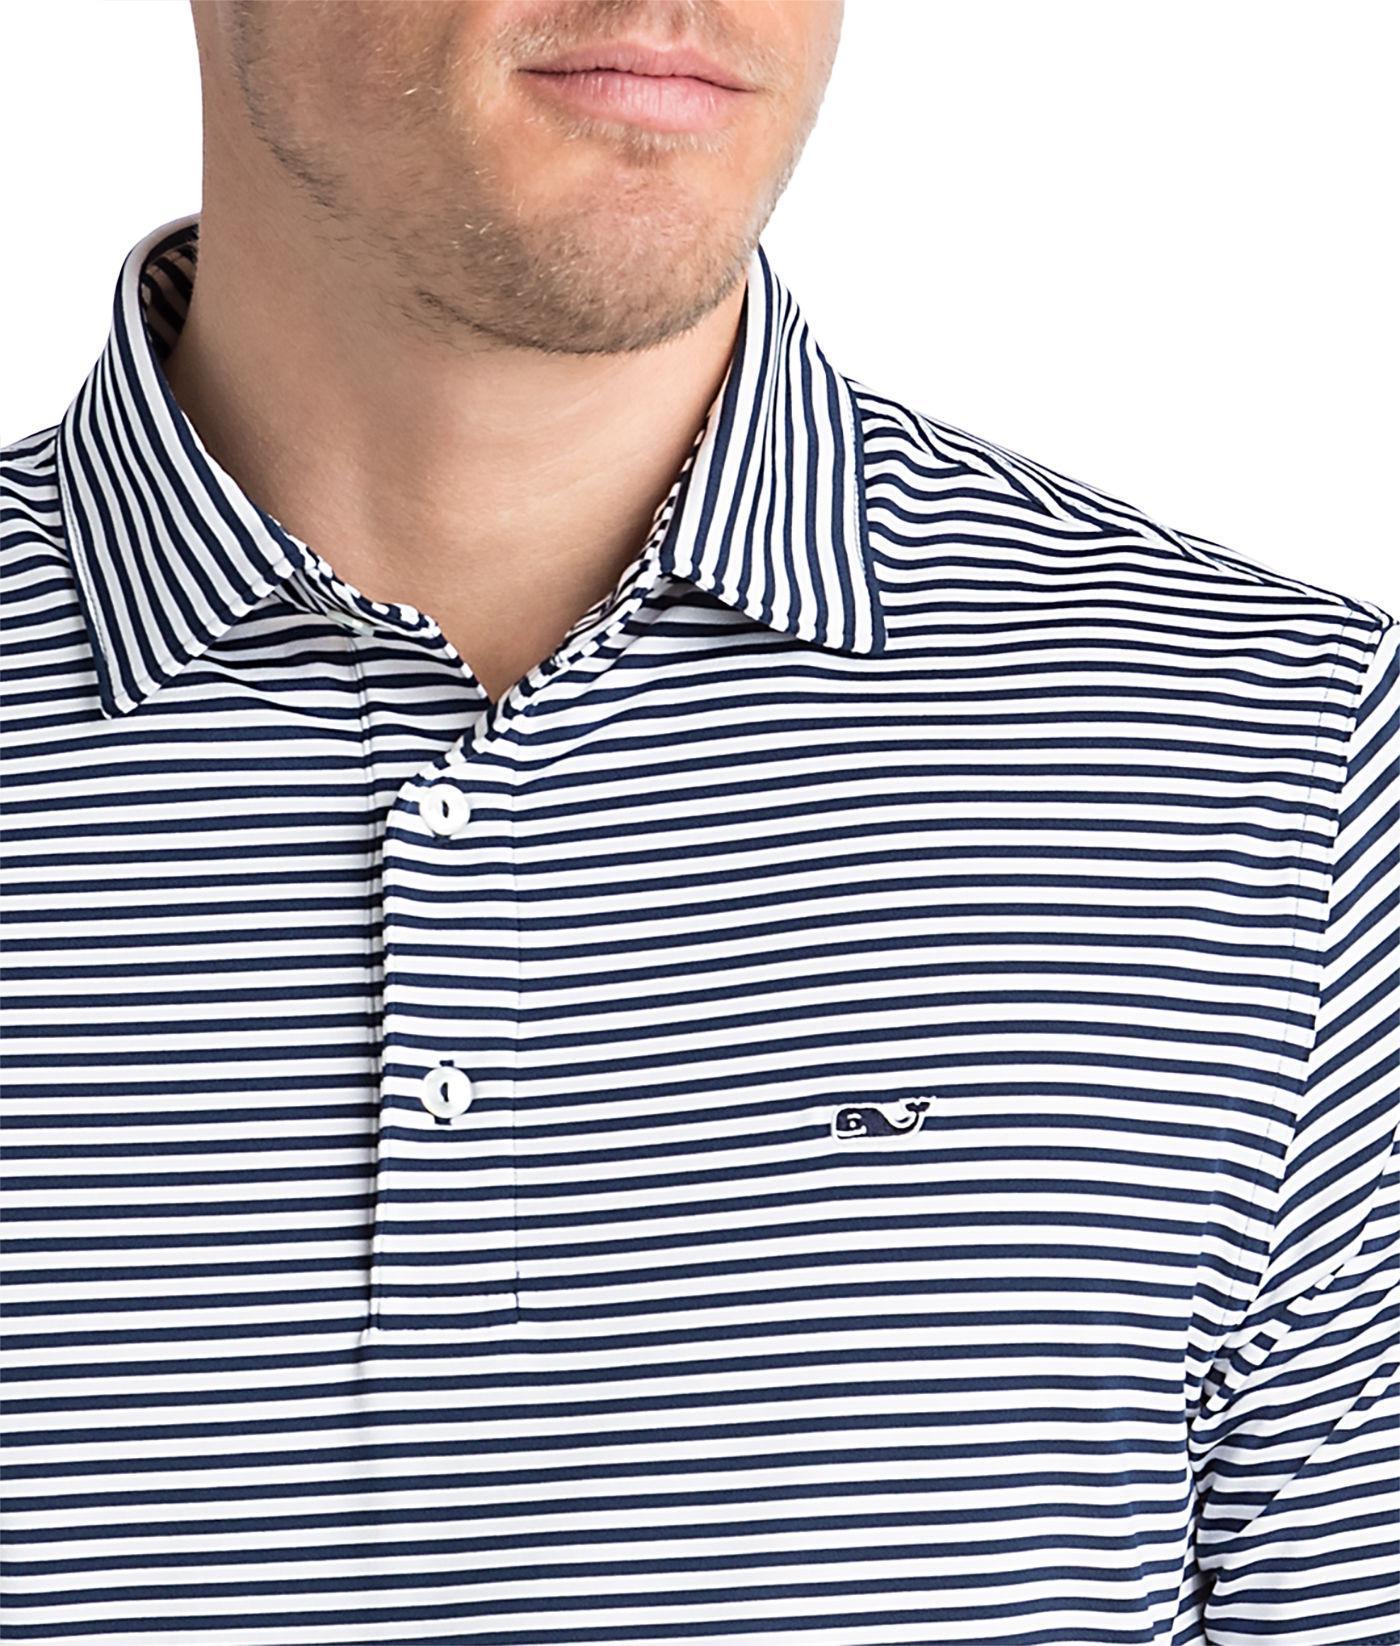 90afcc63 Vineyard Vines - Blue Winstead Stripe Sankaty Performance Polo for Men -  Lyst. View fullscreen